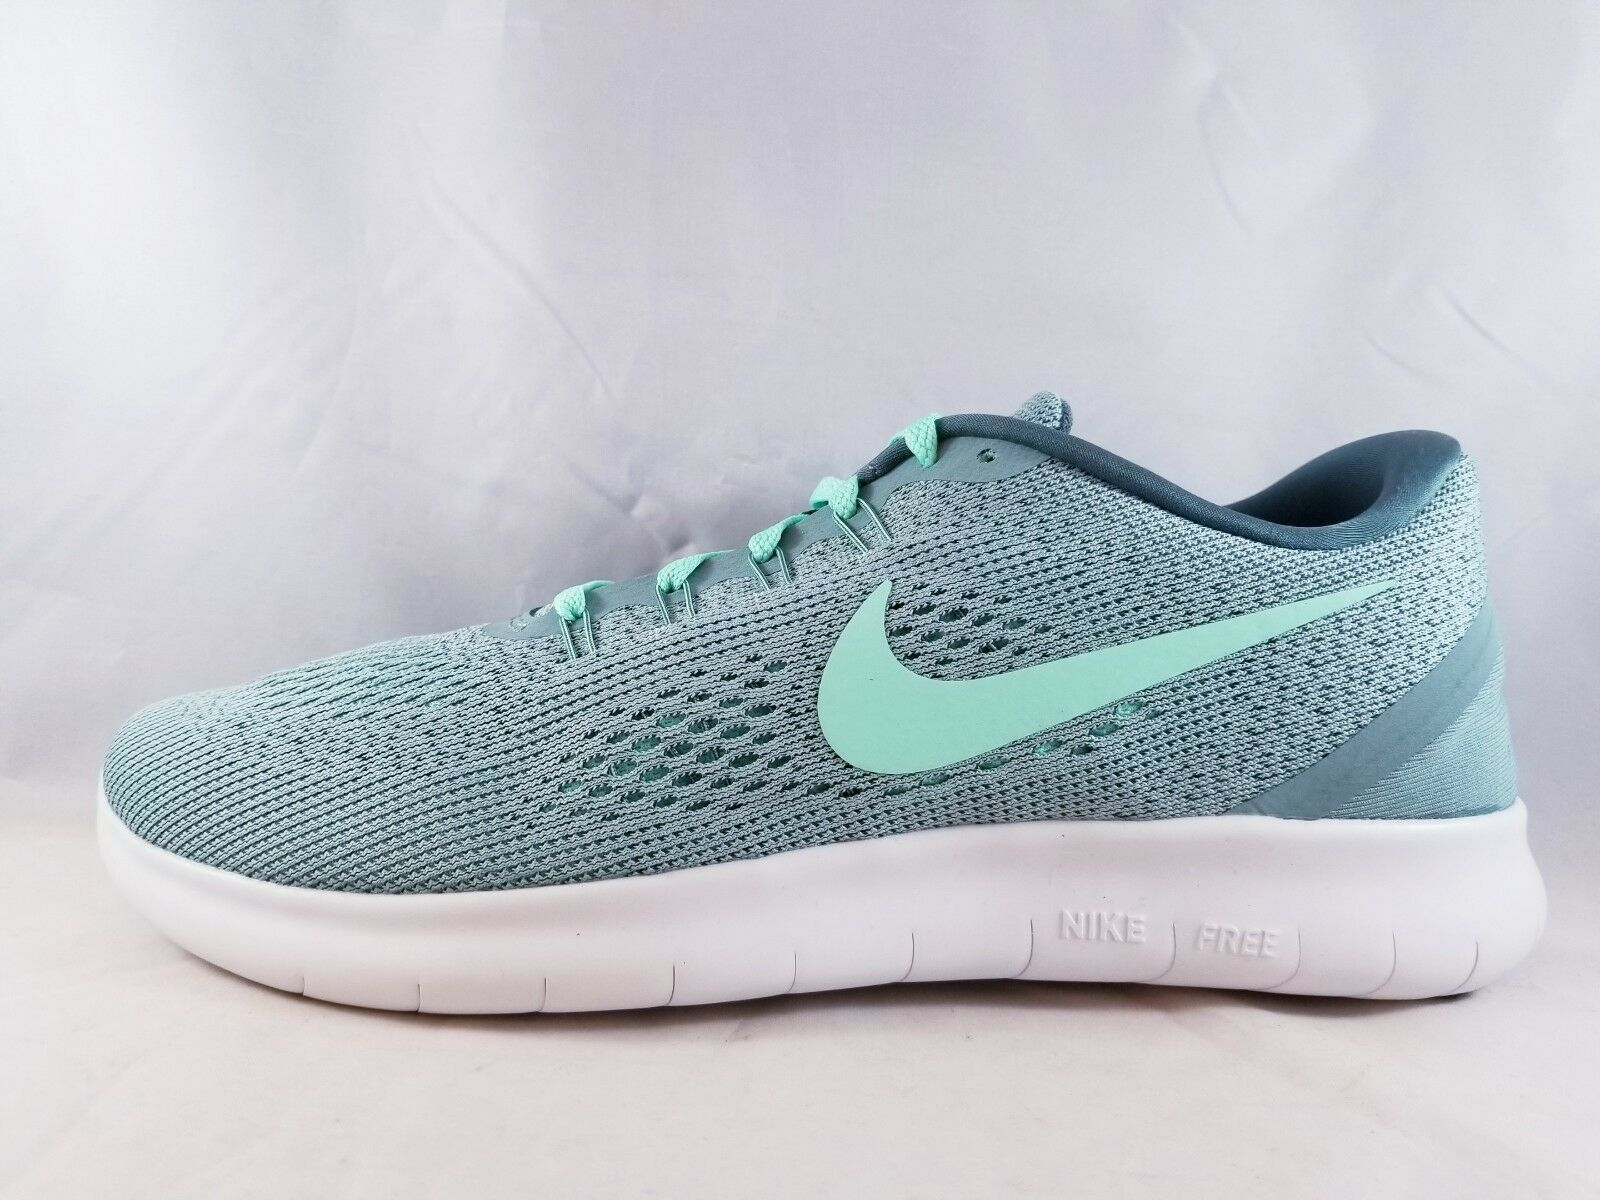 c1b1968468545 ... Nike Size Free RN Women s Running Shoe 831509 004 Size Nike 10.5 5725dd  ...